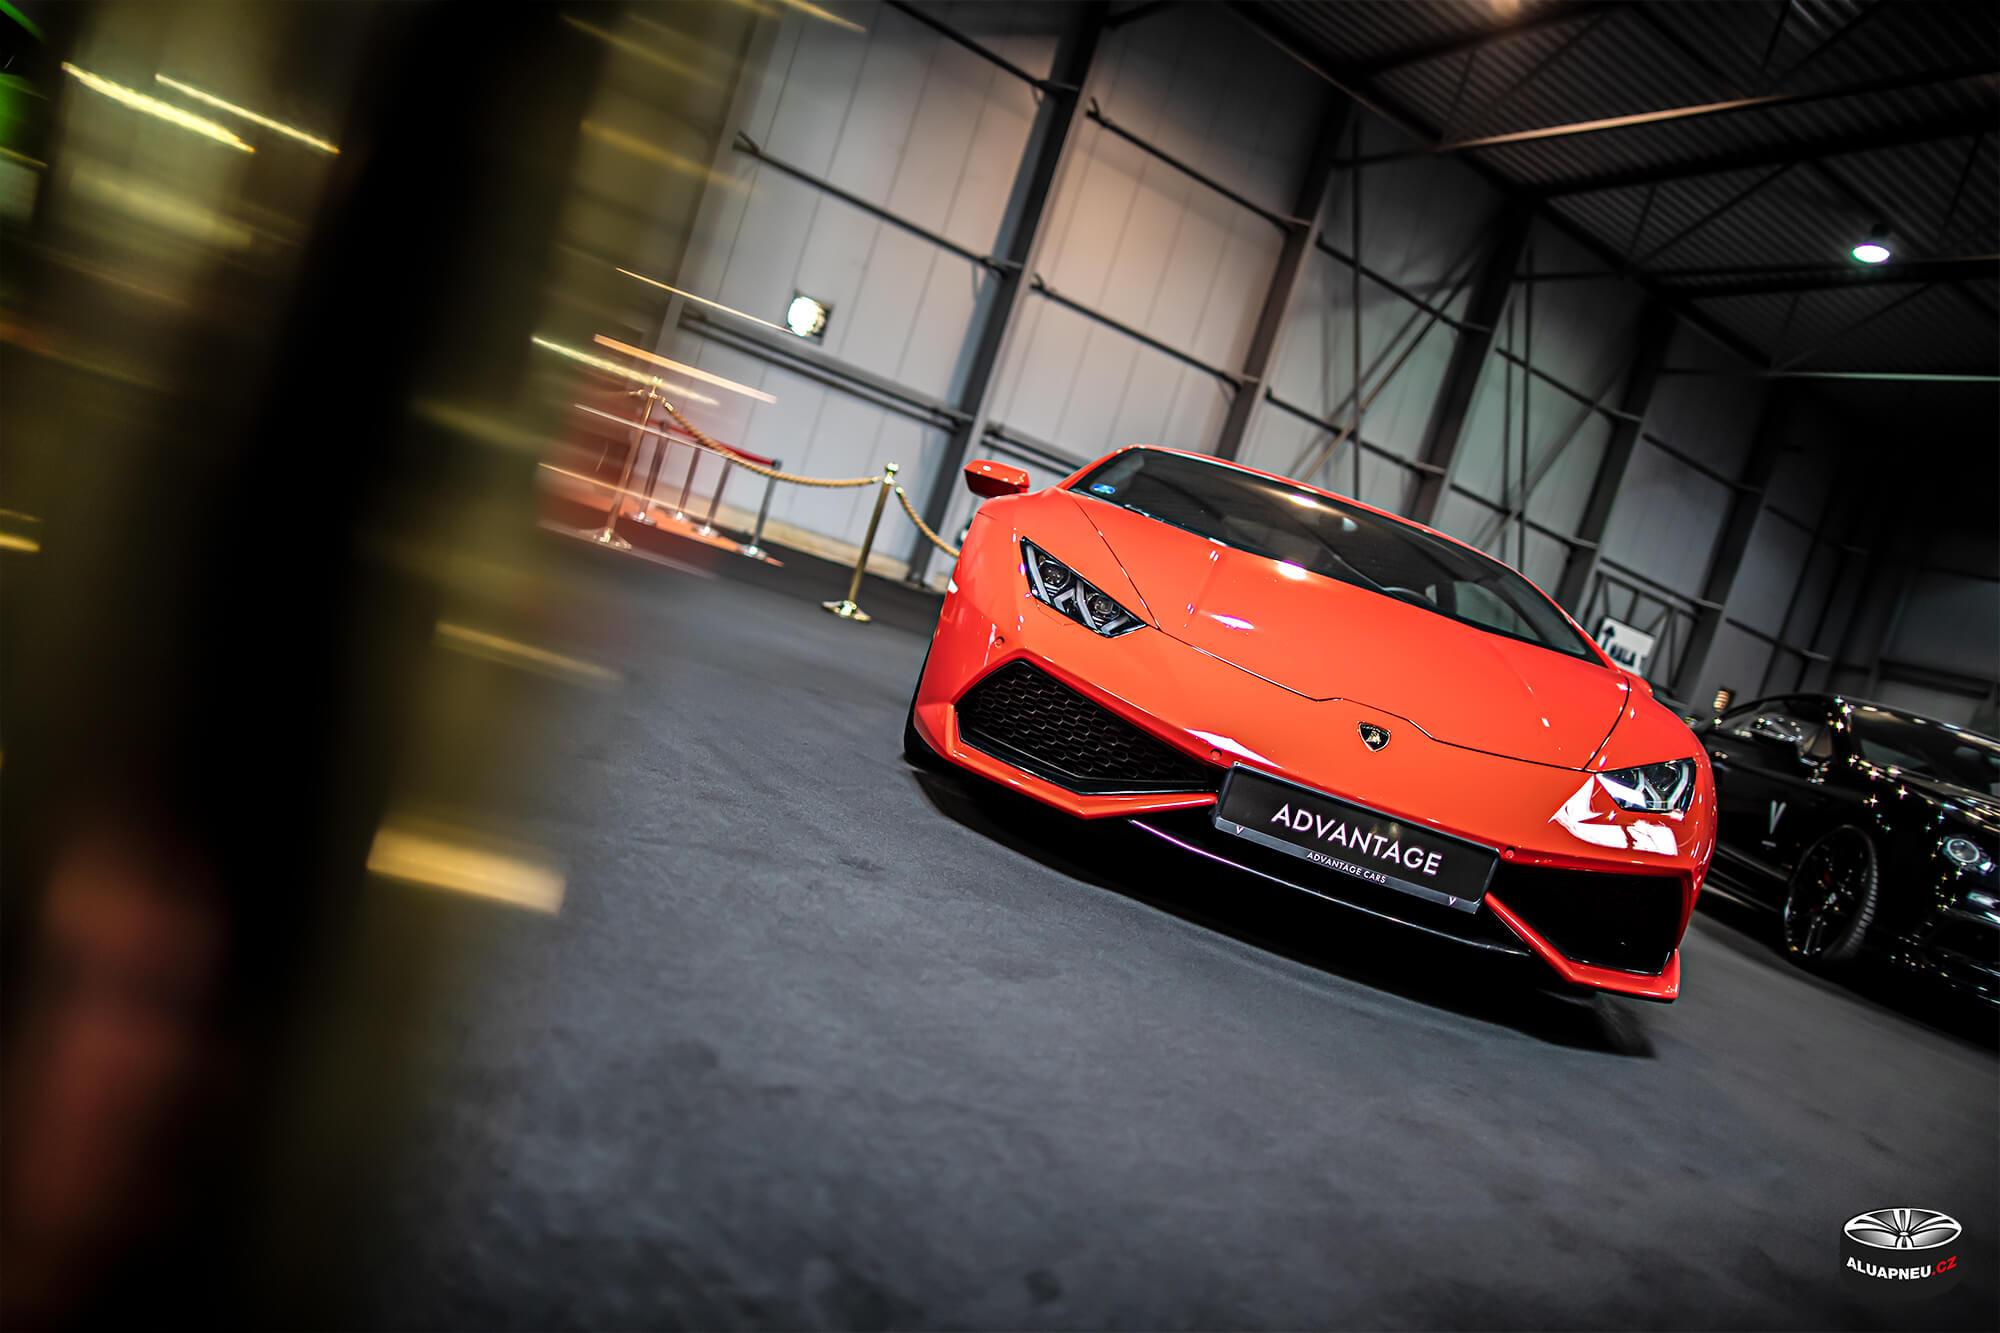 Rudé Lamborghini - Autosalon Praha 2019 - www.aluapneu.cz